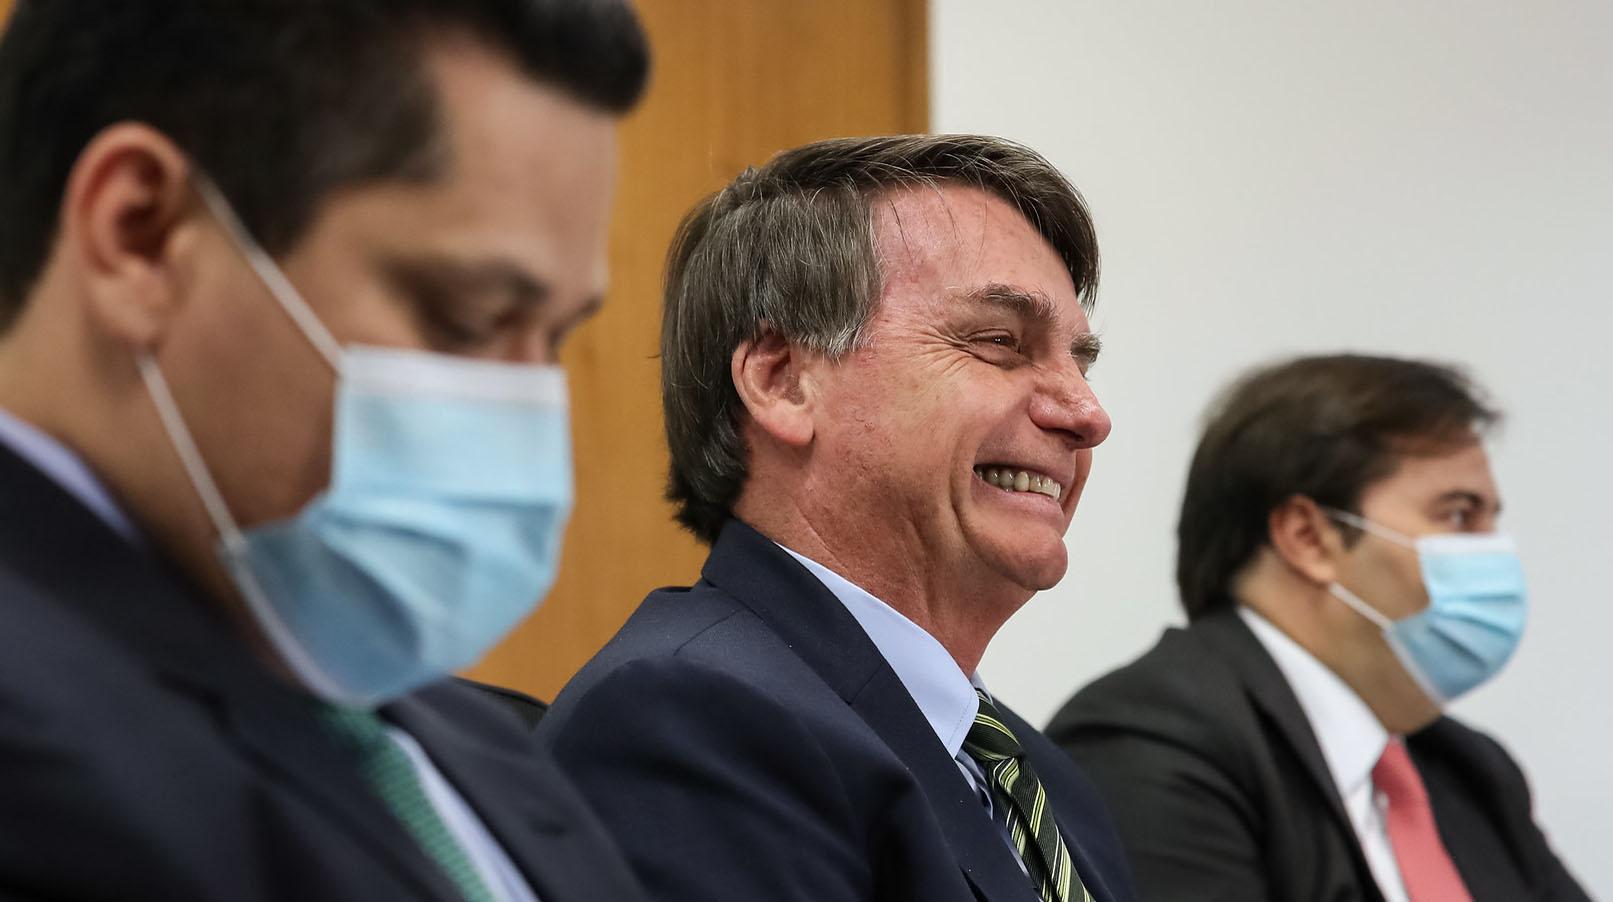 Presidente Jair Bolsonaro sem máscara entre presidentes da Câmara Rodrigo Maia e do Senado David Alcolumbre